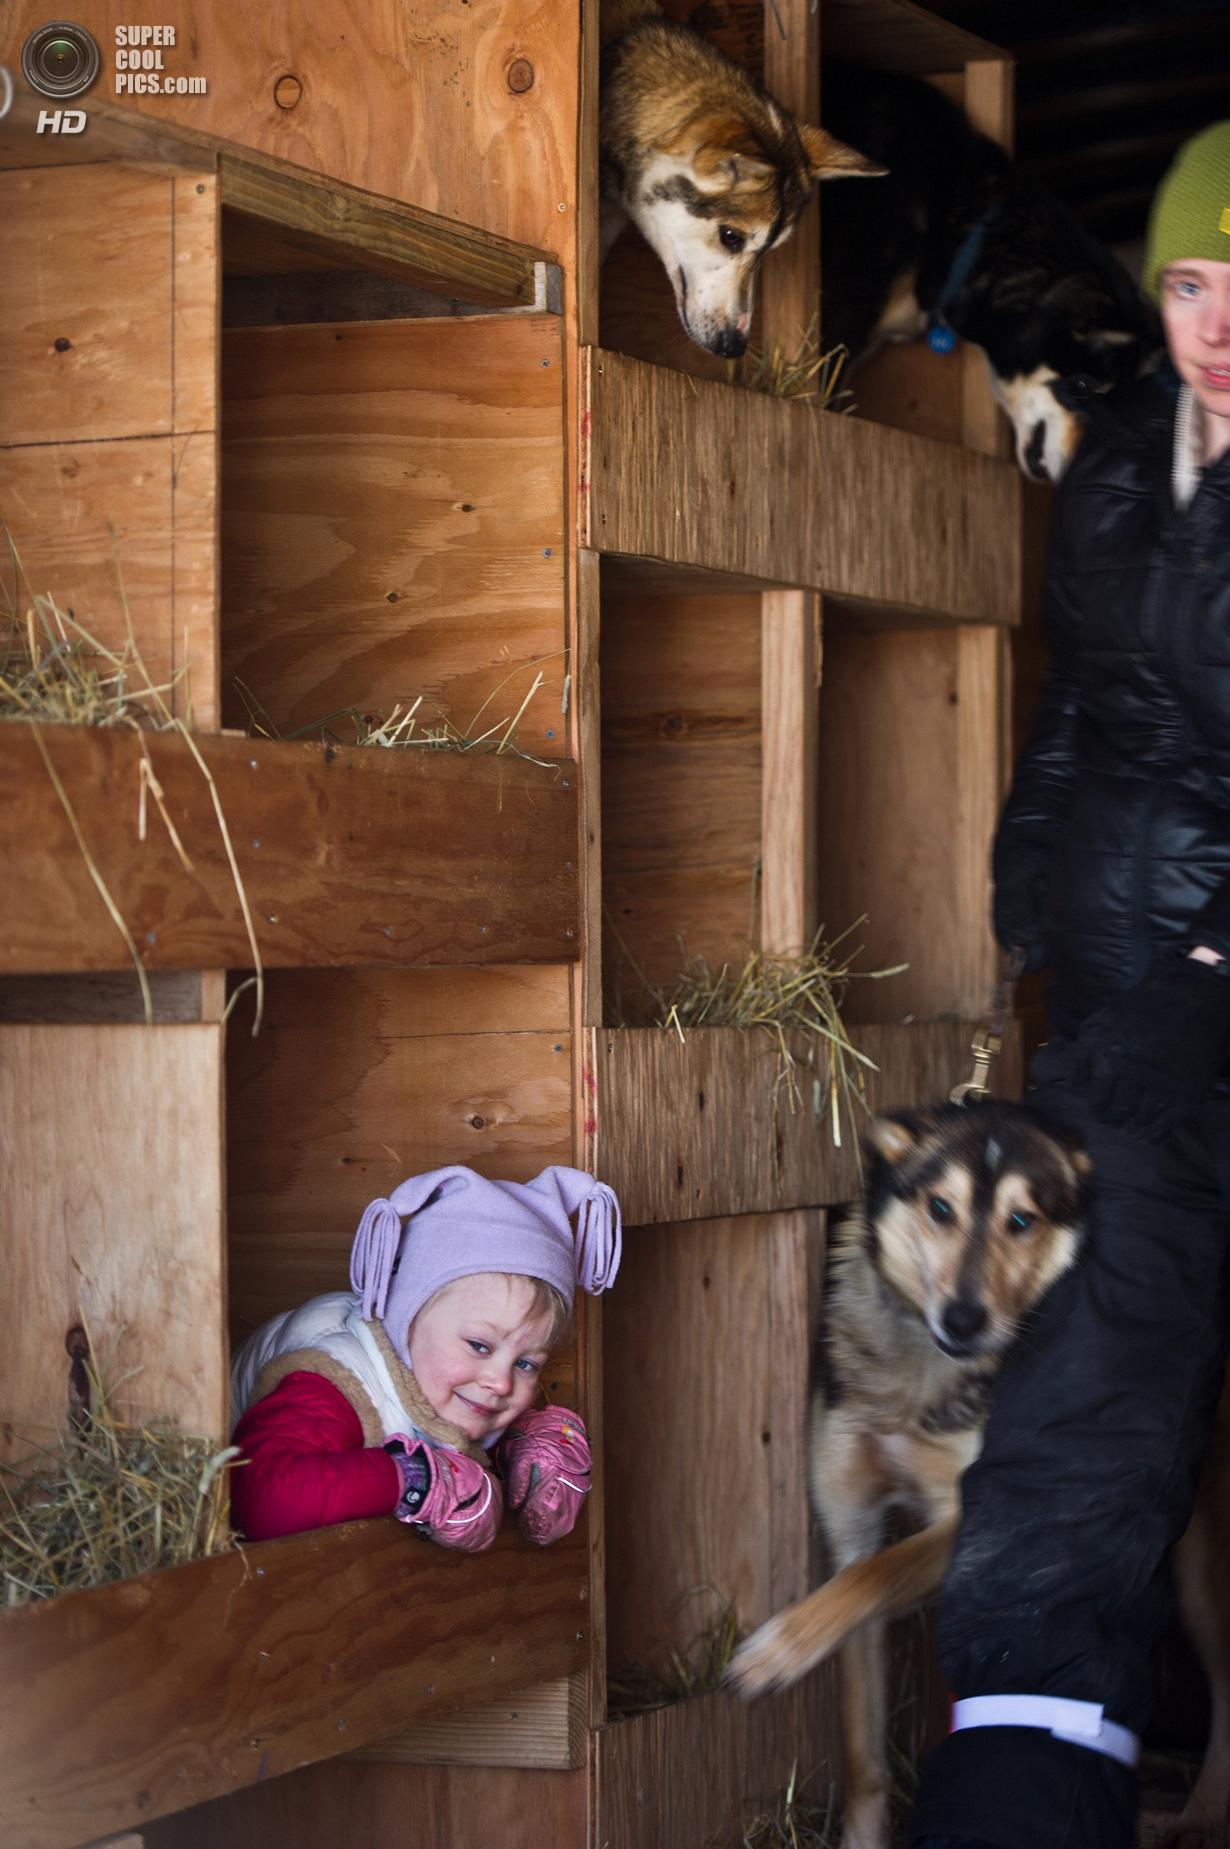 США. Уиллоу, Аляска. 2 марта. Энни Сивей играет с собаками в грузовике. (Erik Hill/Anchorage Daily N